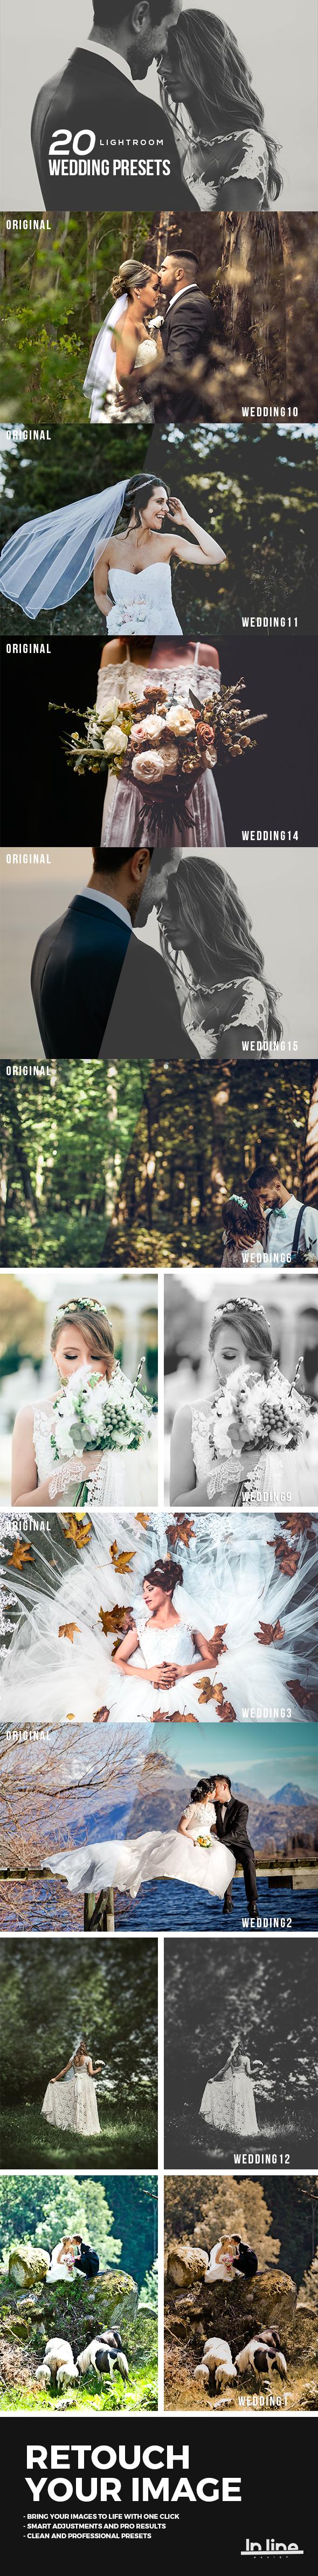 Wedding Premium Lightroom Presets - Wedding Lightroom Presets